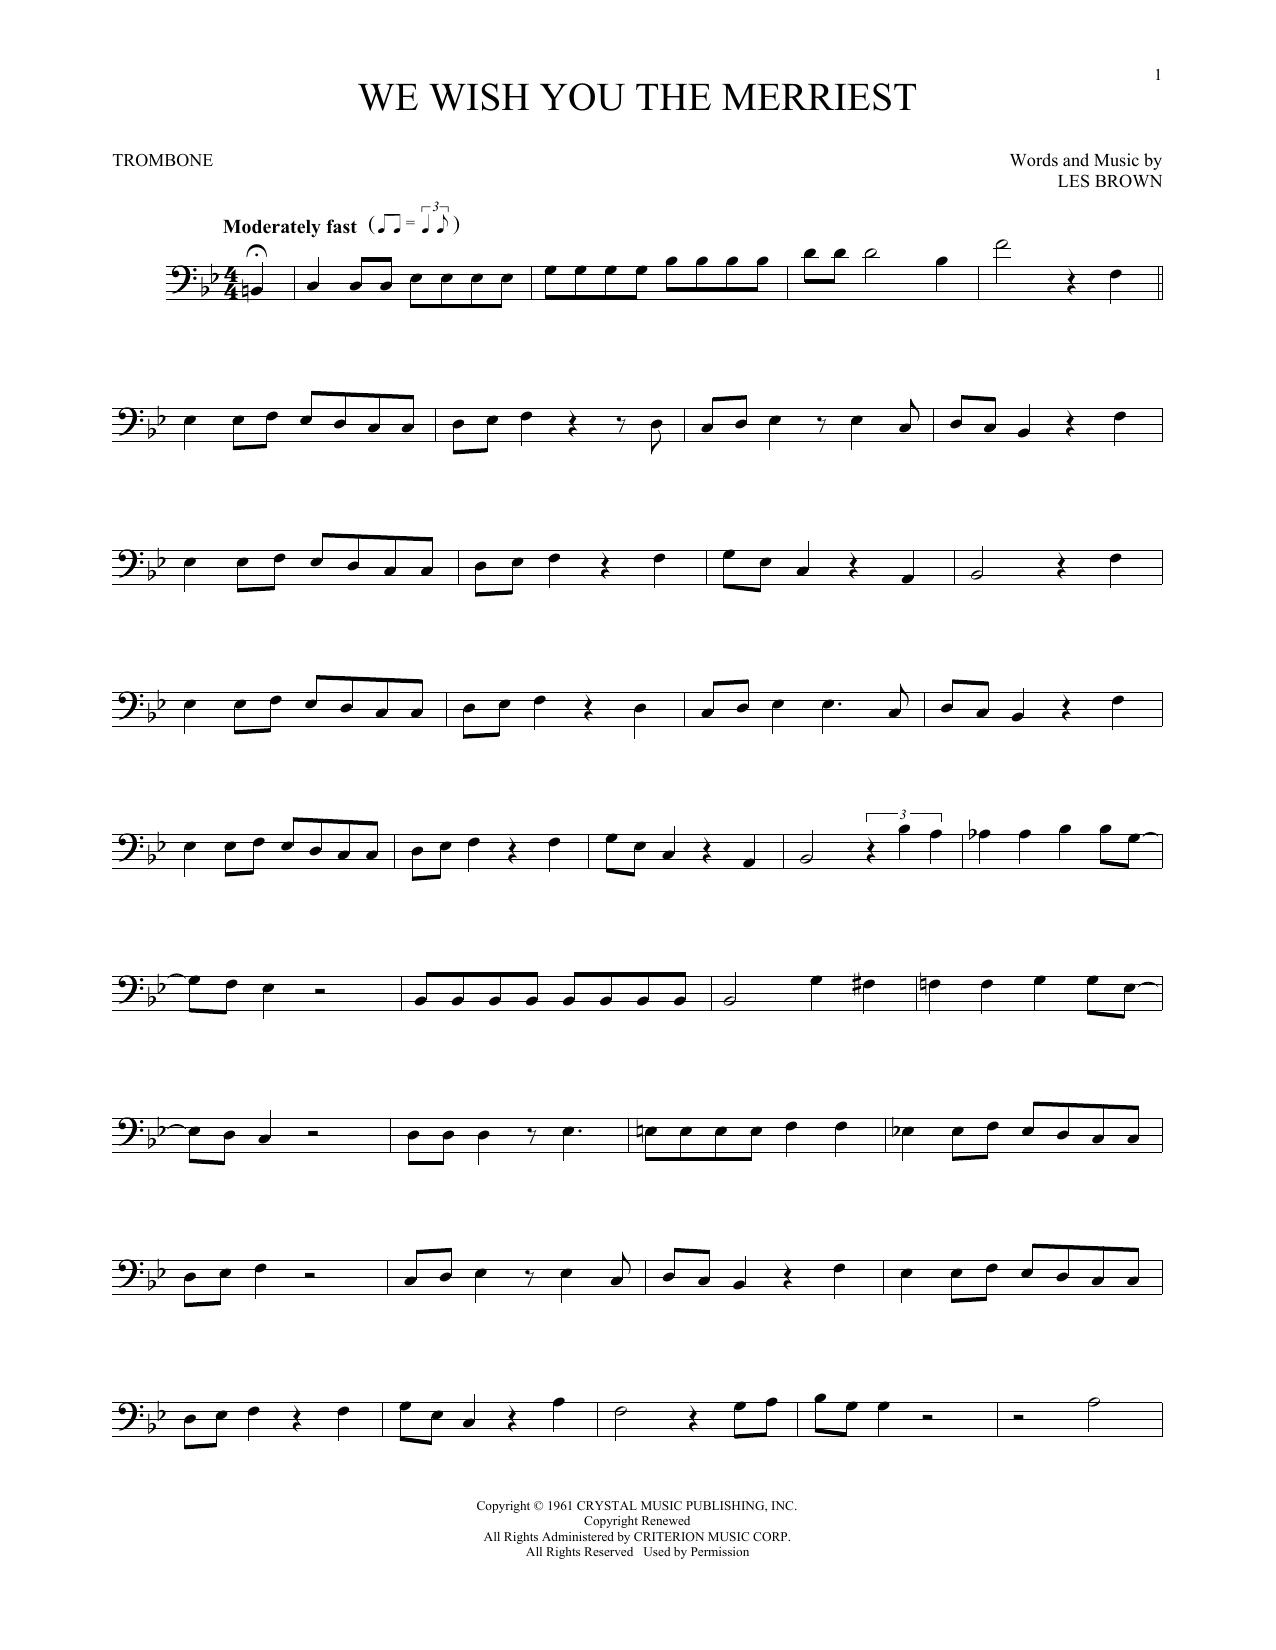 We Wish You The Merriest (Trombone Solo)